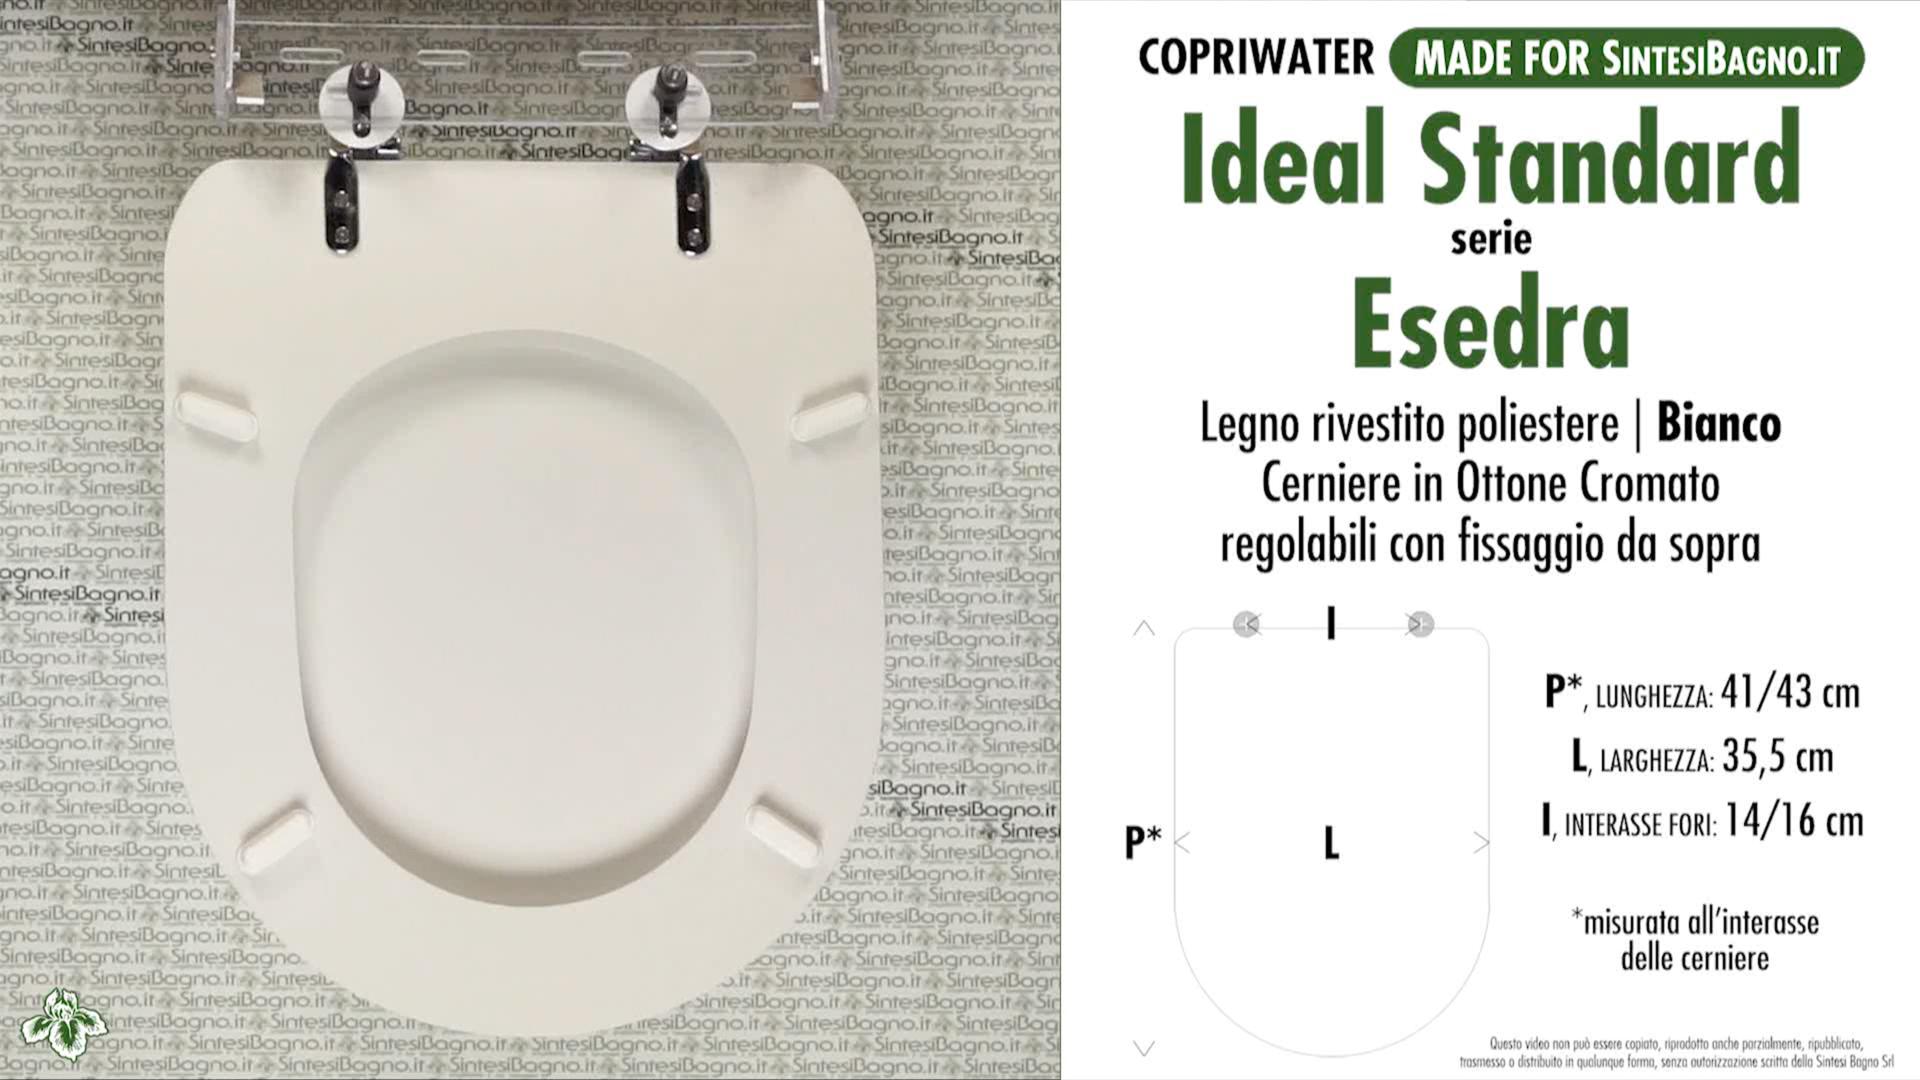 SCHEDA TECNICA MISURE copriwater IDEAL STANDARD ESEDRA